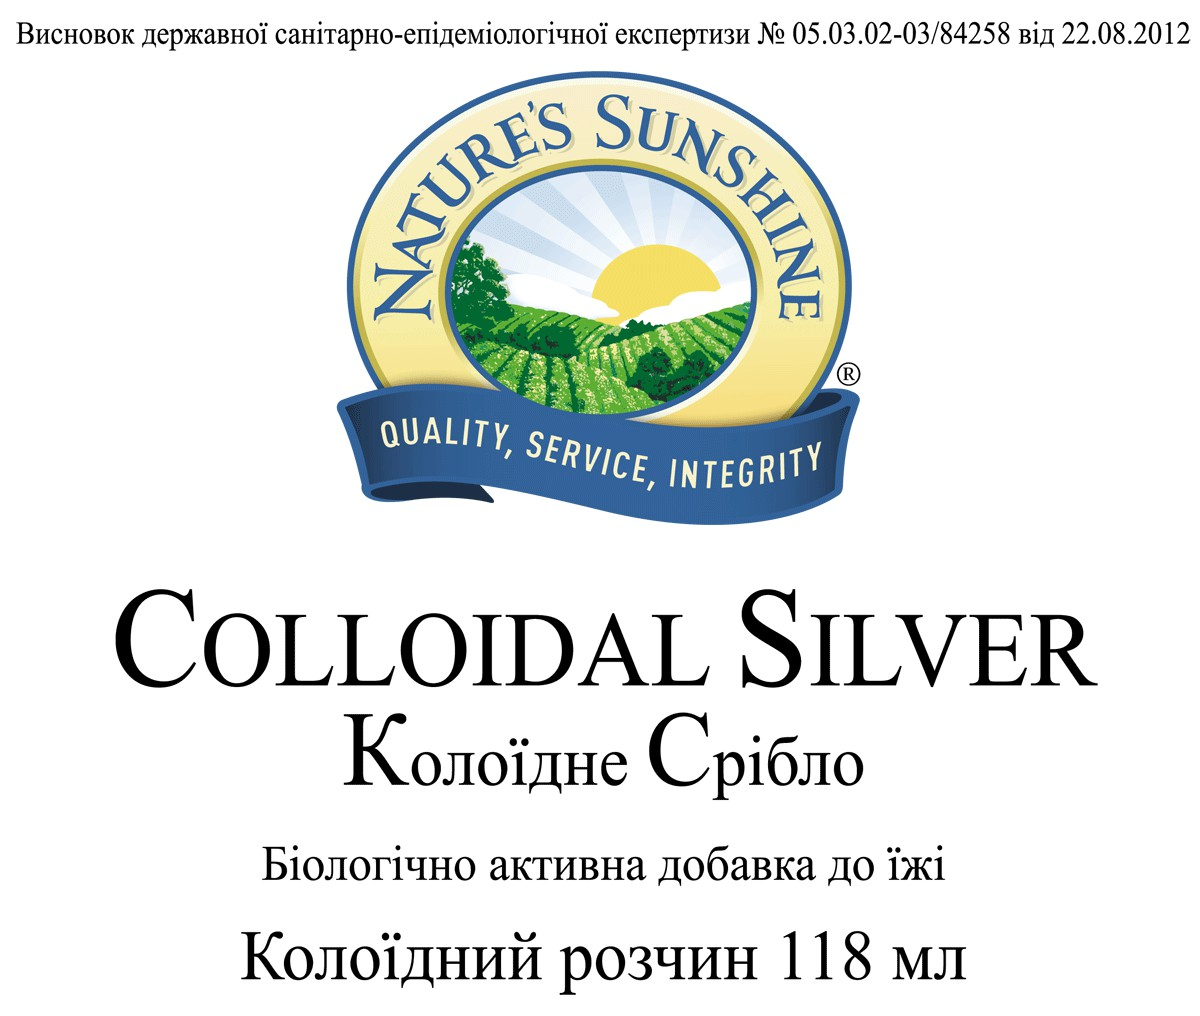 Набор 1+1: Colloidal Silver [4074] (1шт) + Hista Block (776) (1шт) (01.16)